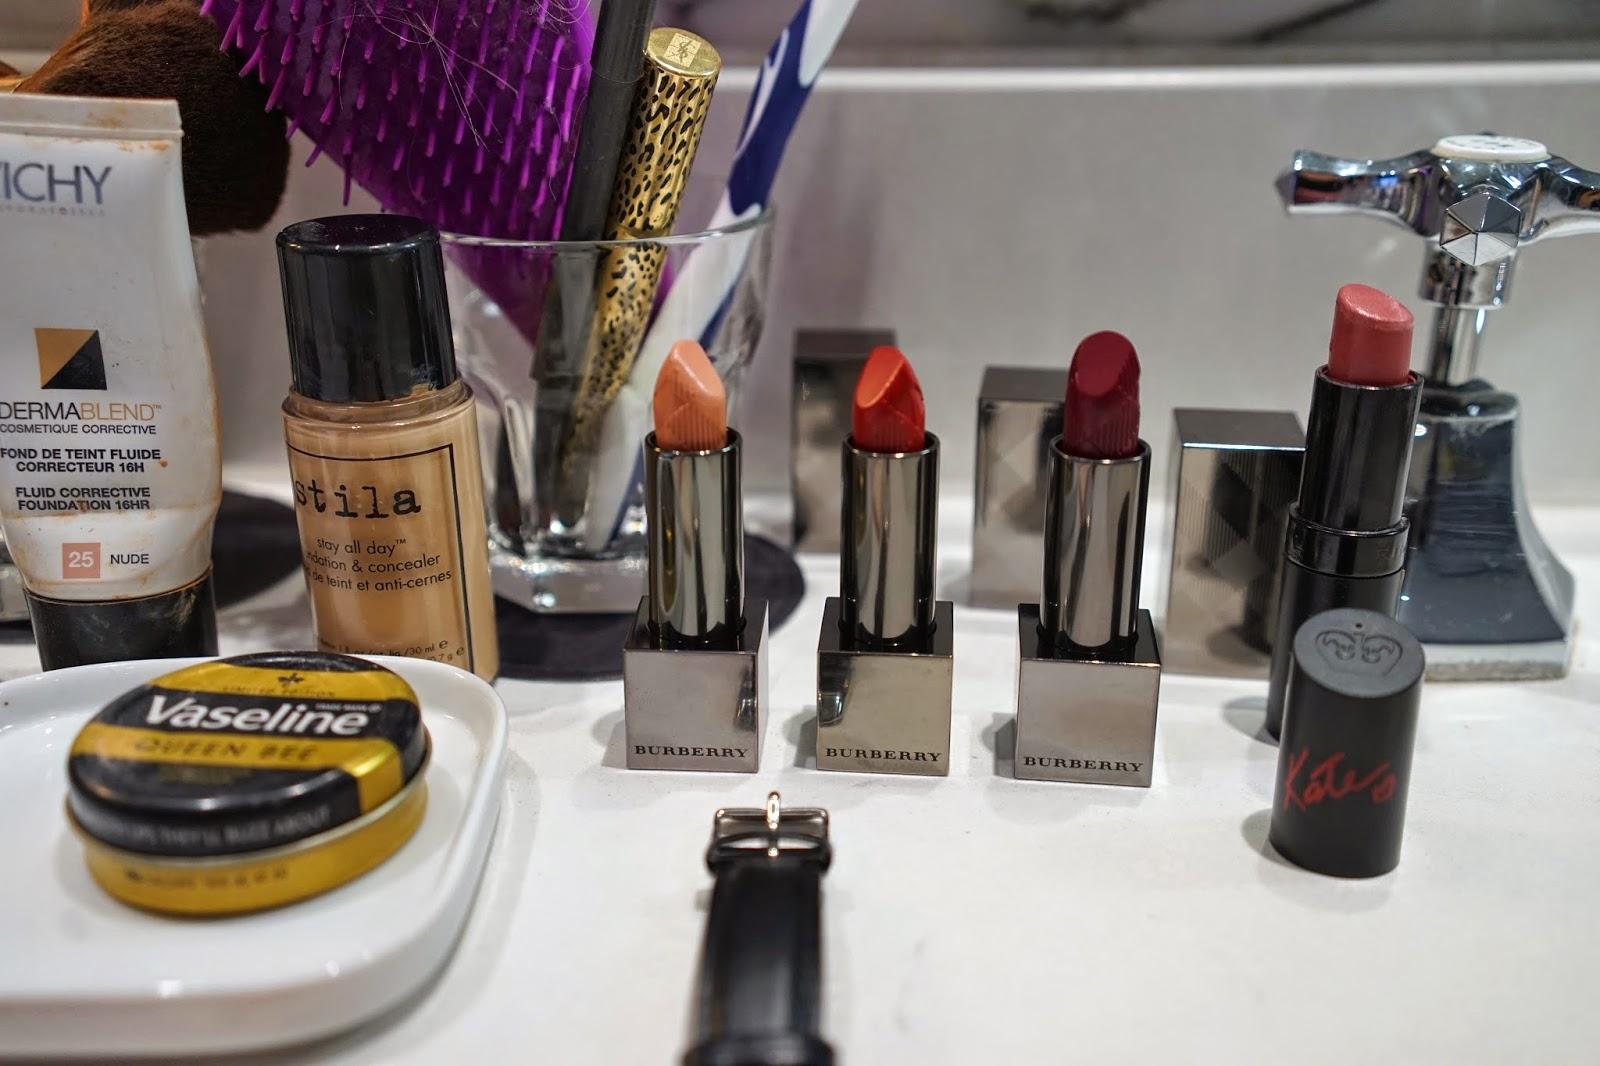 Burberry kisses lipsticks